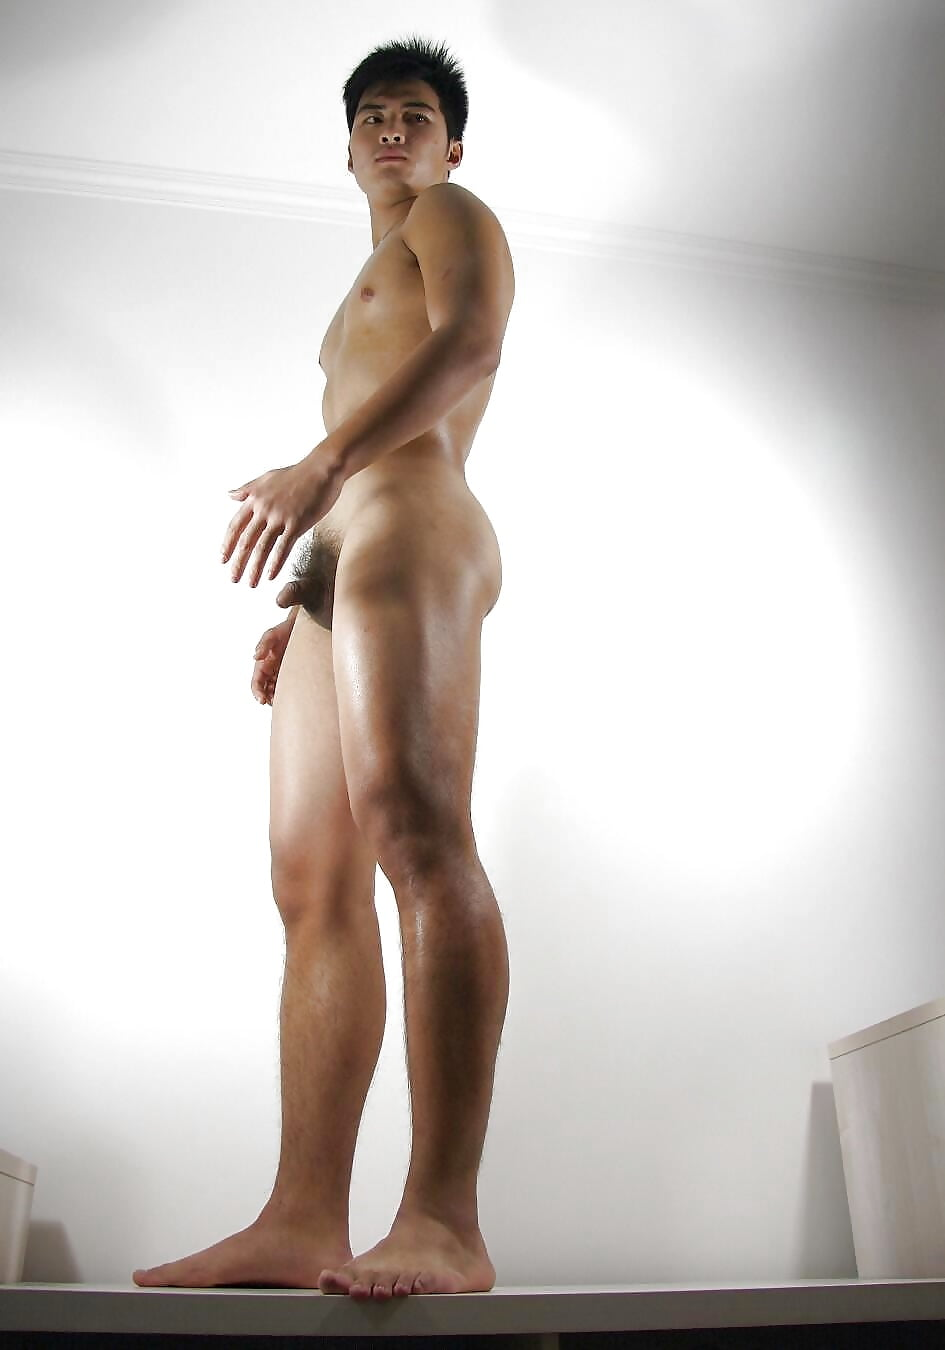 Saturdaysurprise butt naked francisco lachowski